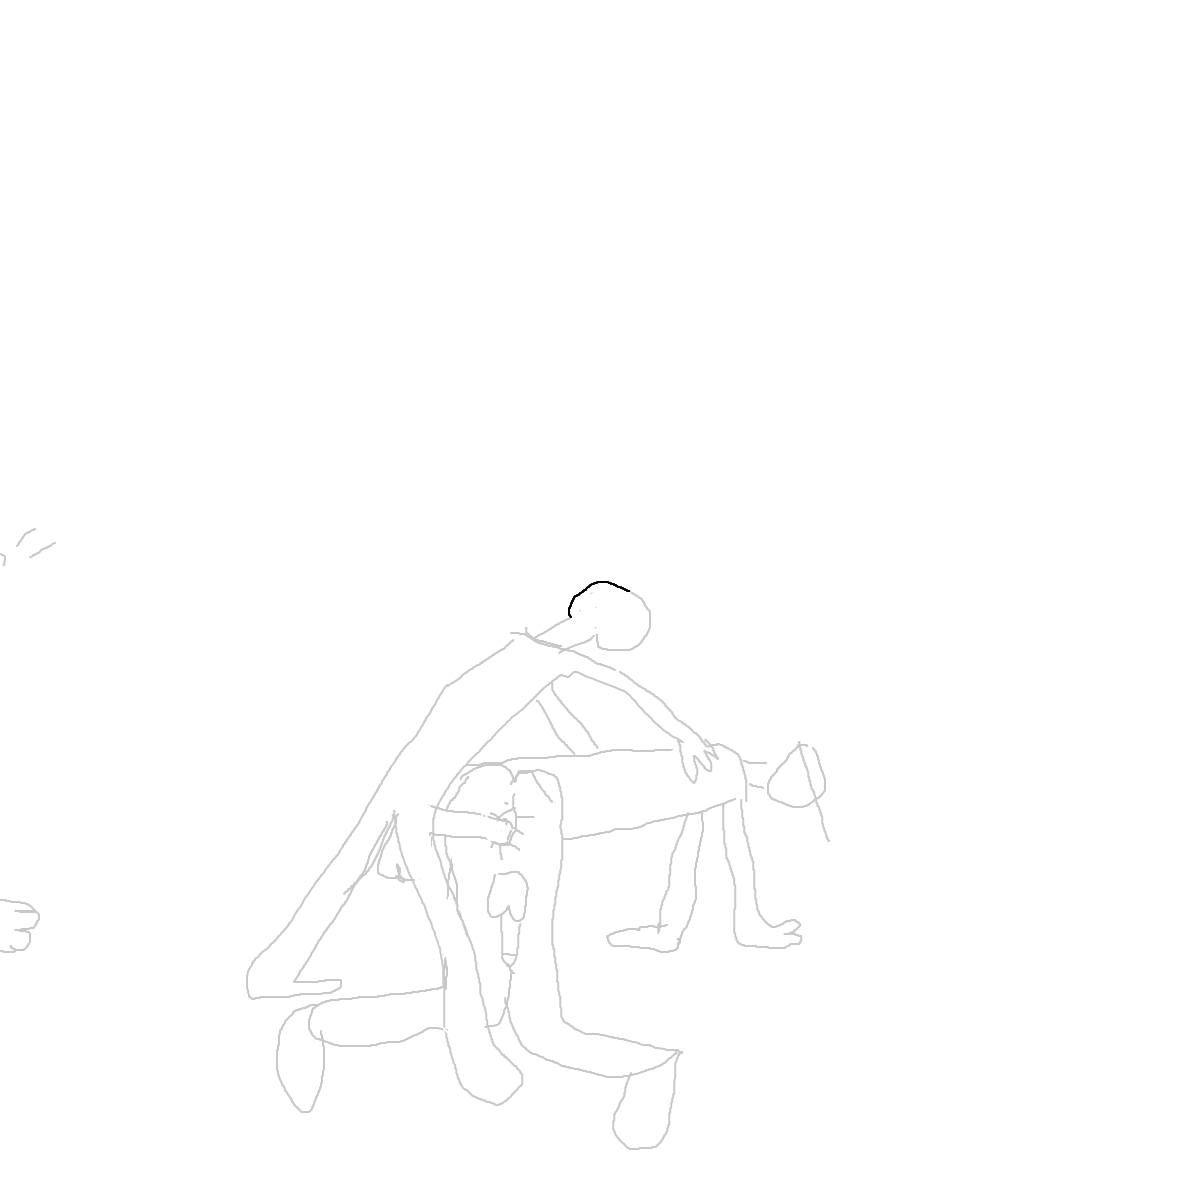 BAAAM drawing#19120 lat:60.3902854919433600lng: 25.6669178009033200